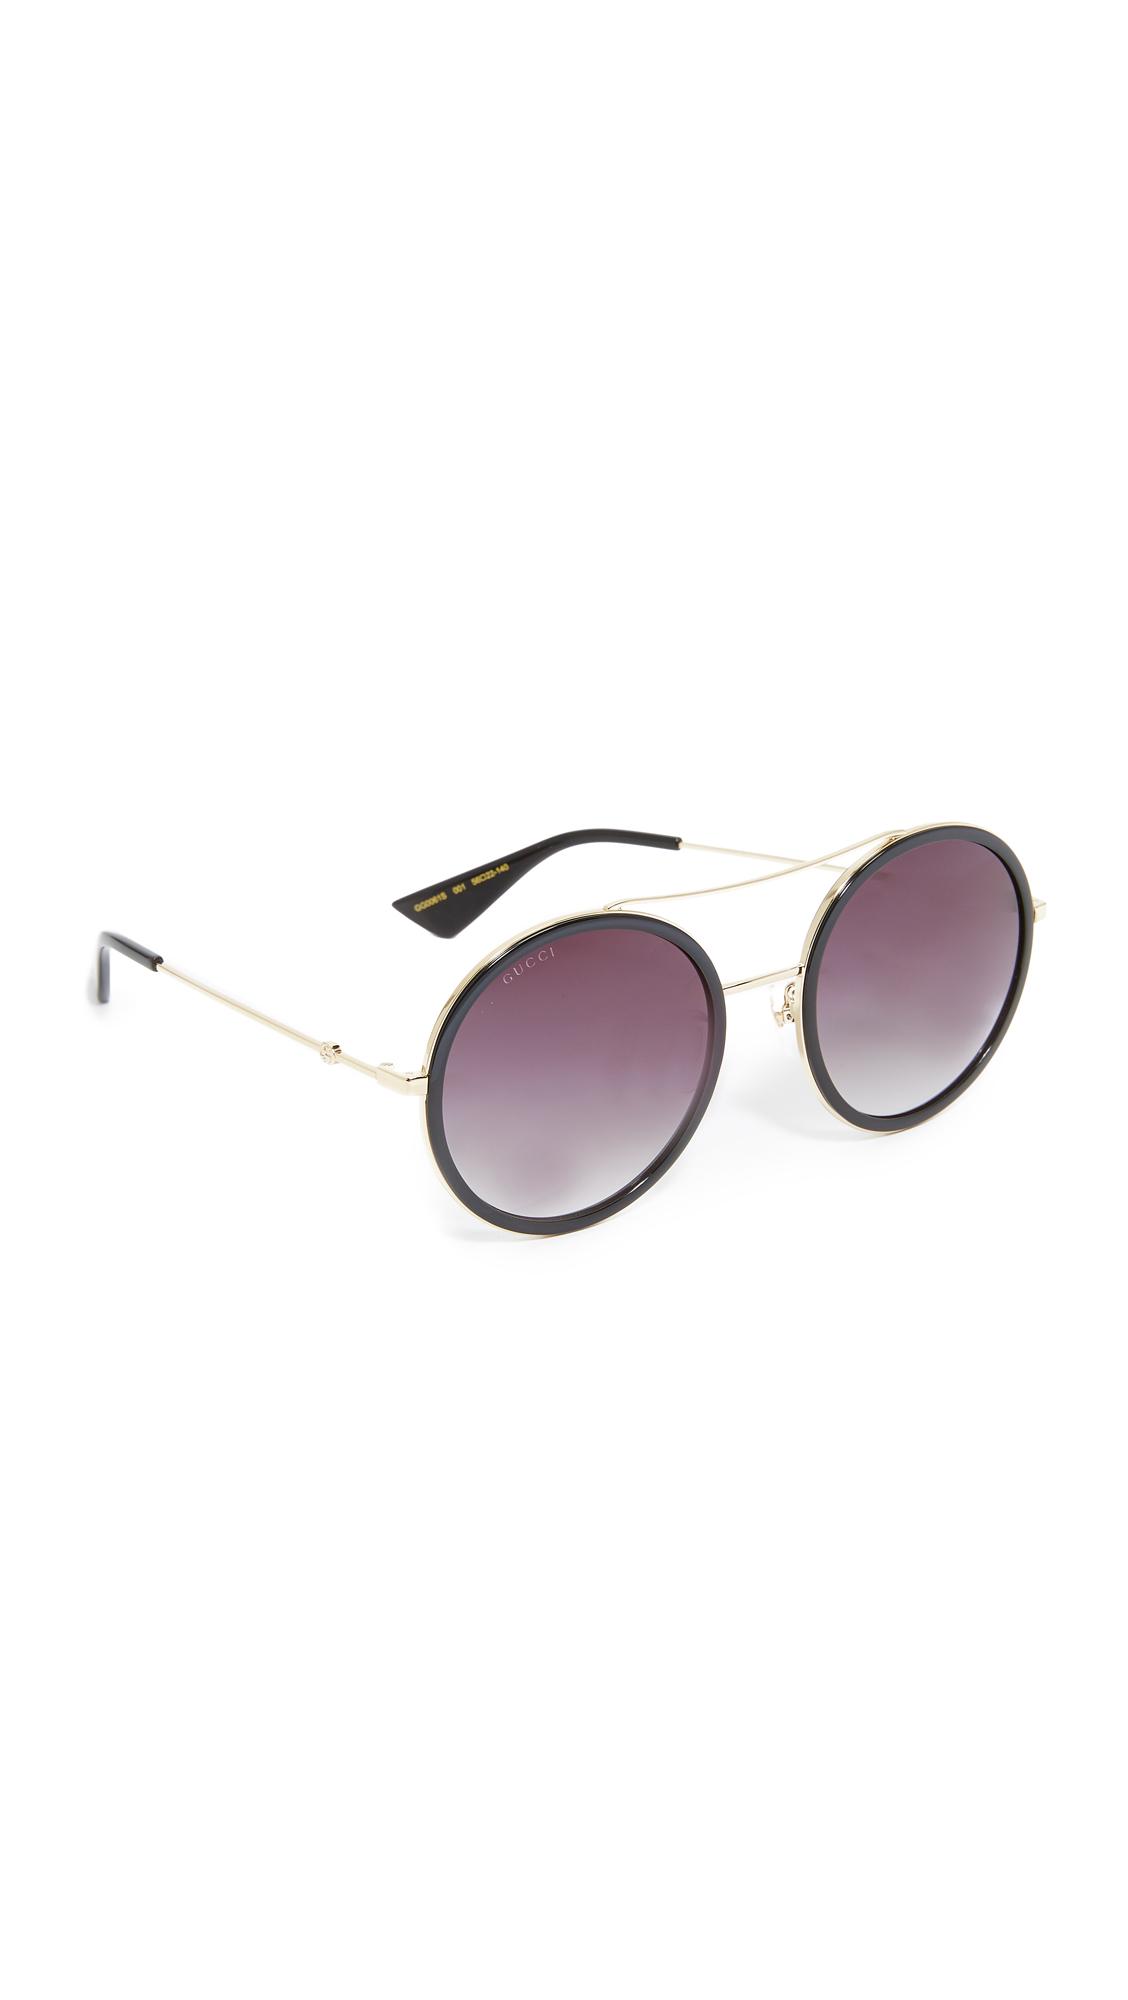 Gucci Urban Web Block Round Aviator Sunglasses - Gold/Grey at Shopbop